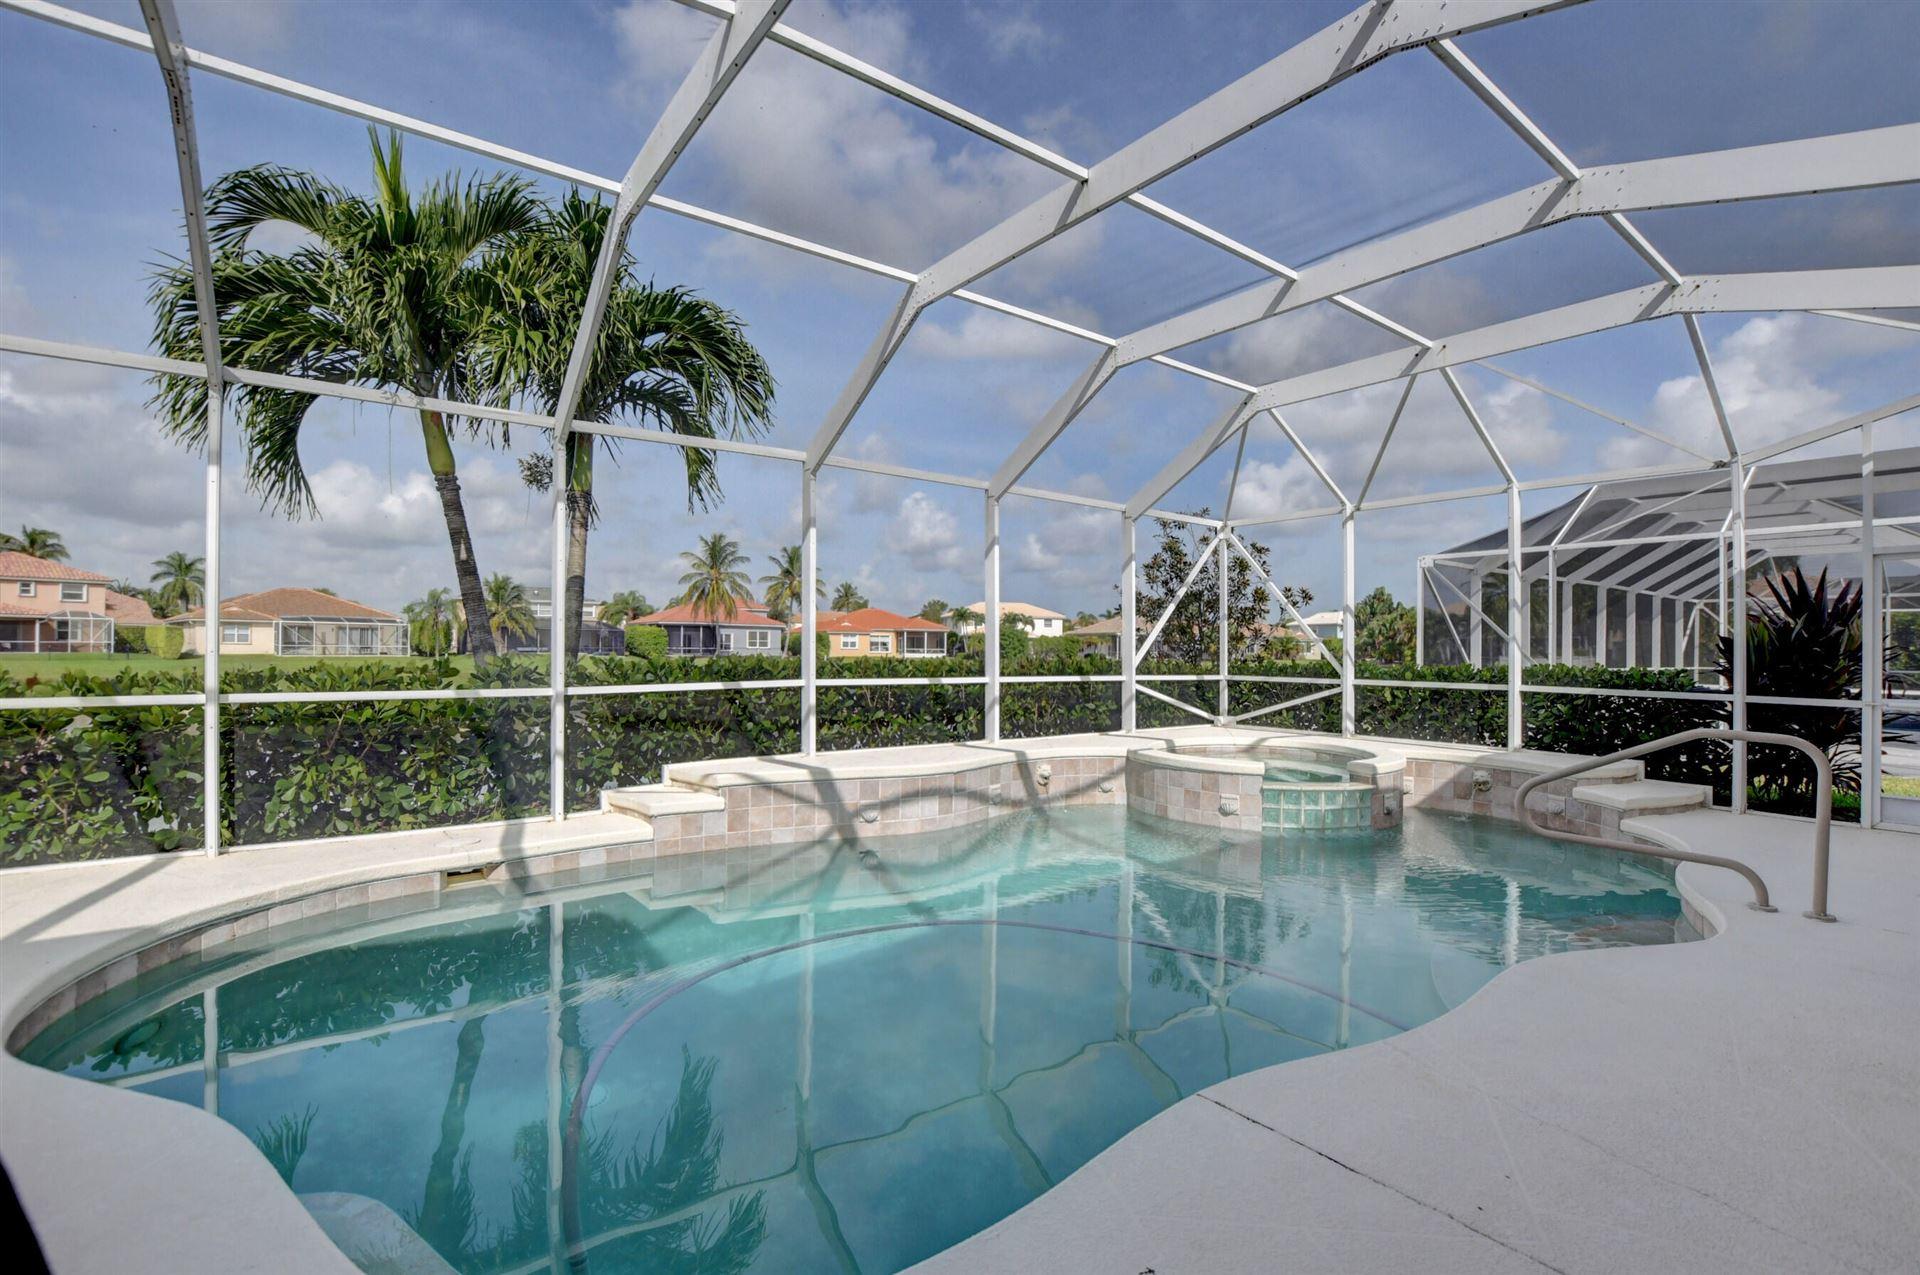 Photo of 12626 Maypan Drive, Boca Raton, FL 33428 (MLS # RX-10753710)